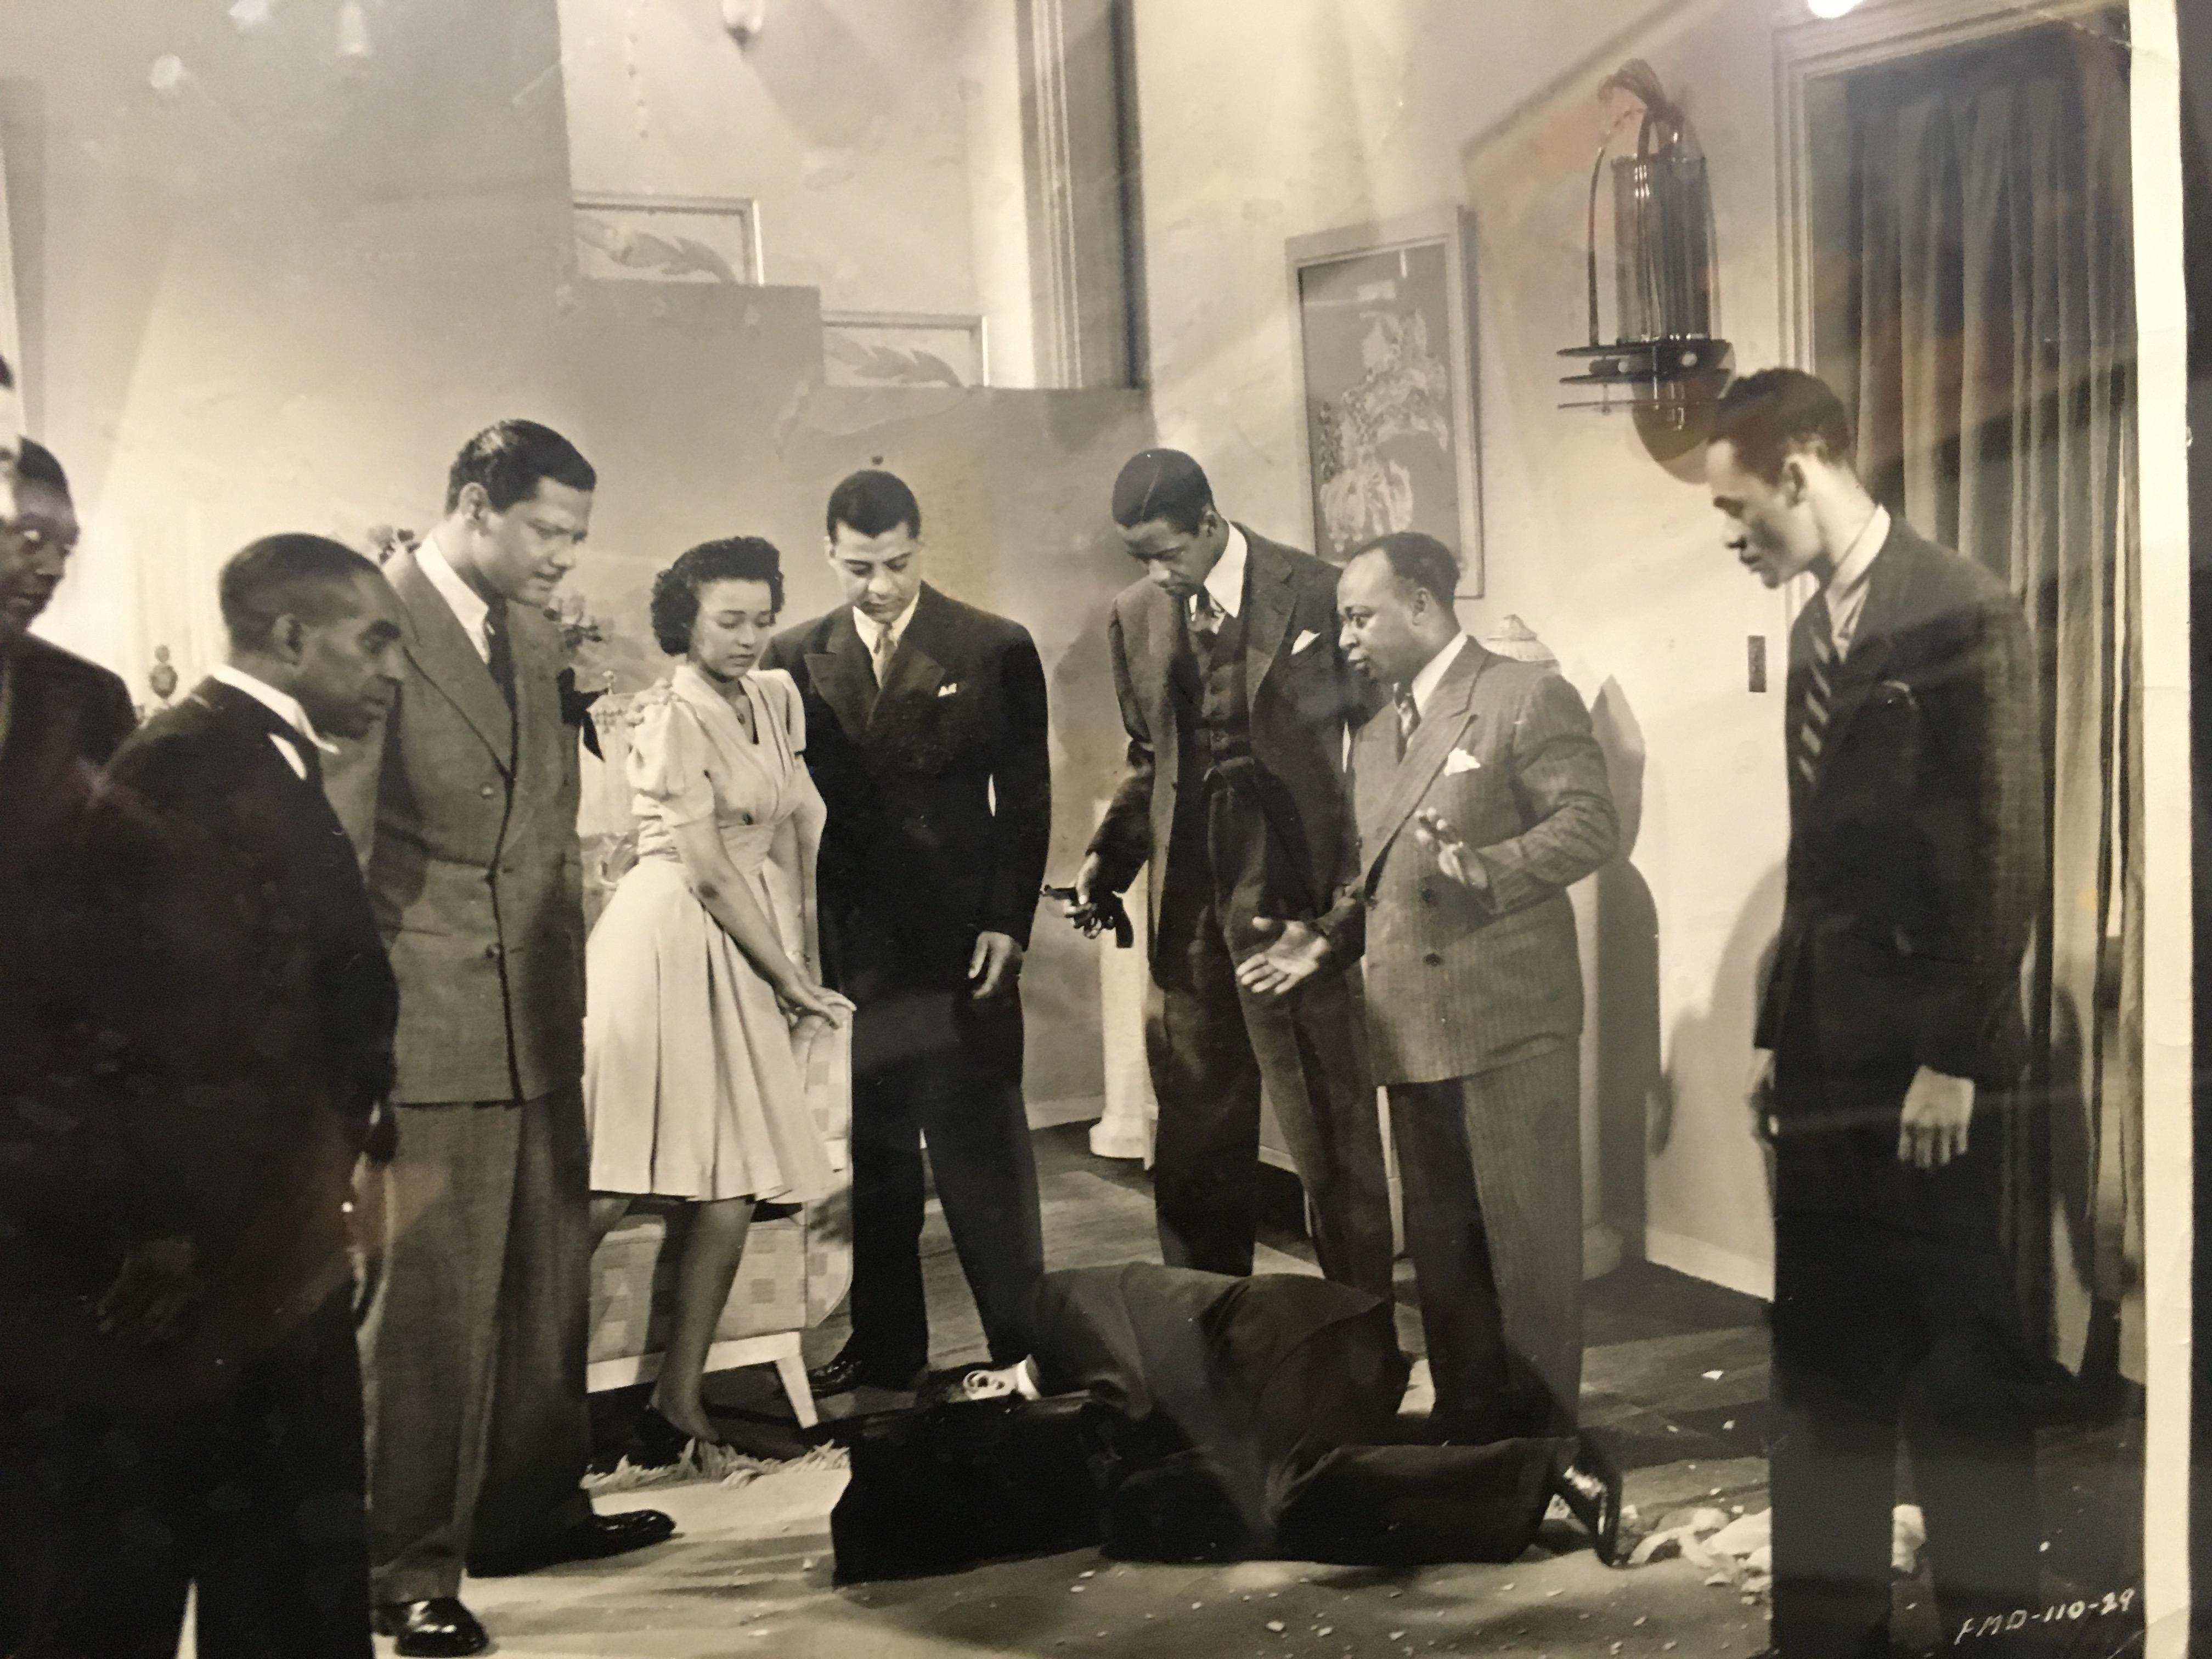 Jess Lee Brooks, Laurence Criner, Dorothy Dandridge, Reginald Fenderson, Monte Hawley, Vernon McCalla, Mantan Moreland, Edward Thompson, Niel Webster, and Pete Webster in Four Shall Die (1940)